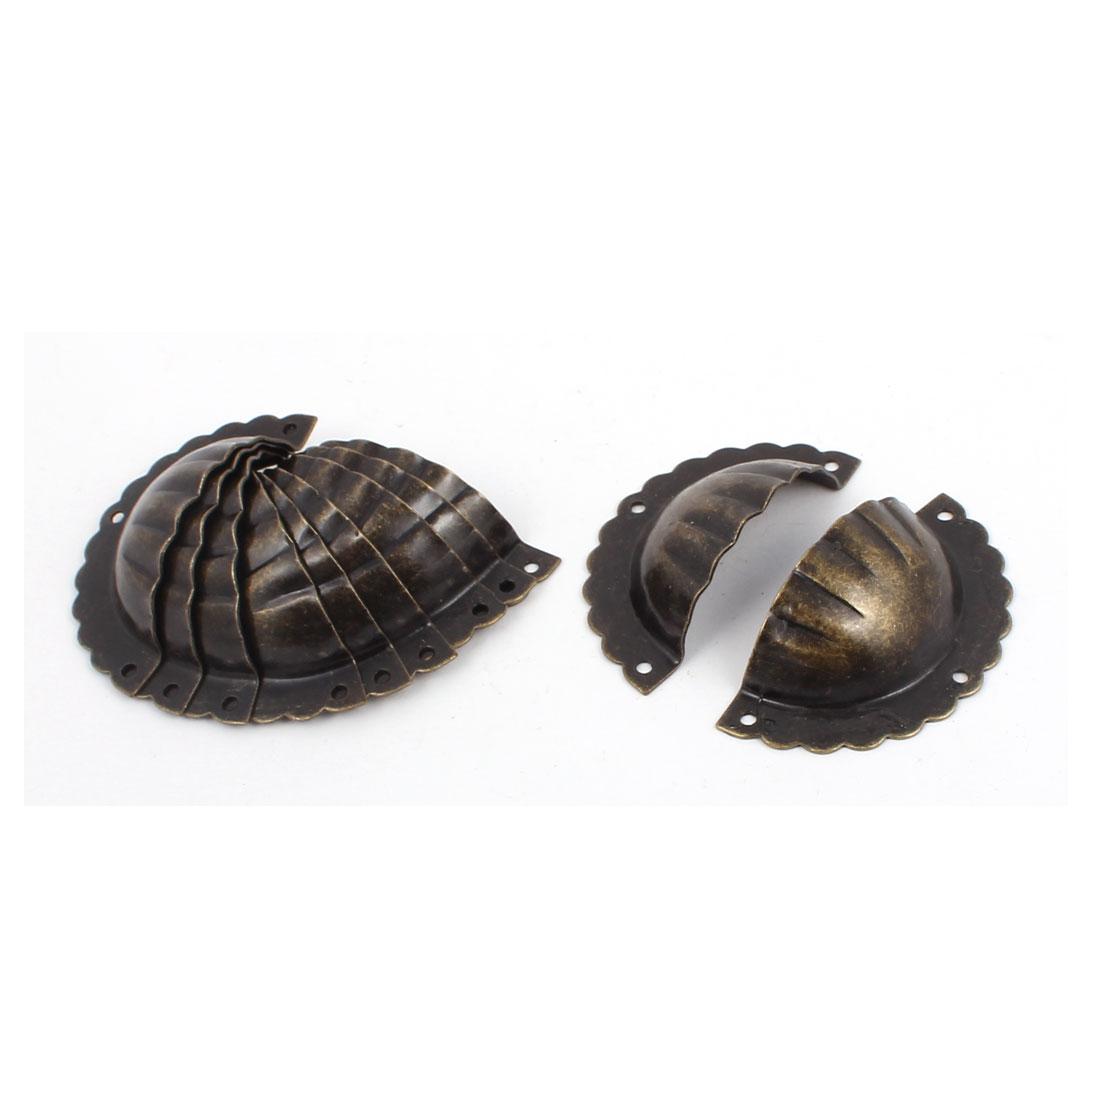 Drawer Retro Style Shell Shaped Pull Handle Bronze Tone 71mmx37mmx20mm 10pcs